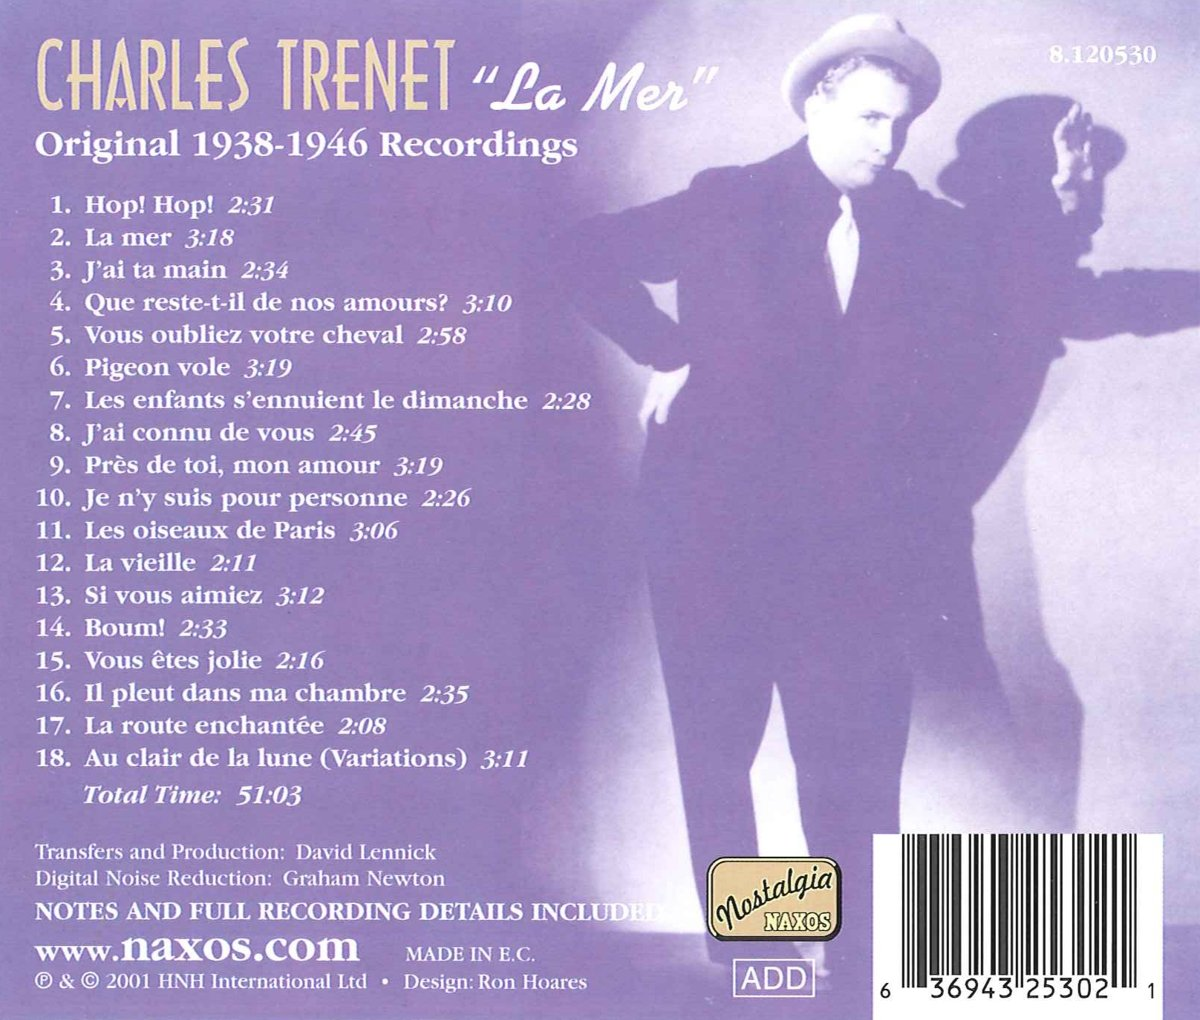 Charles Trénet La Mer (1938-1946)